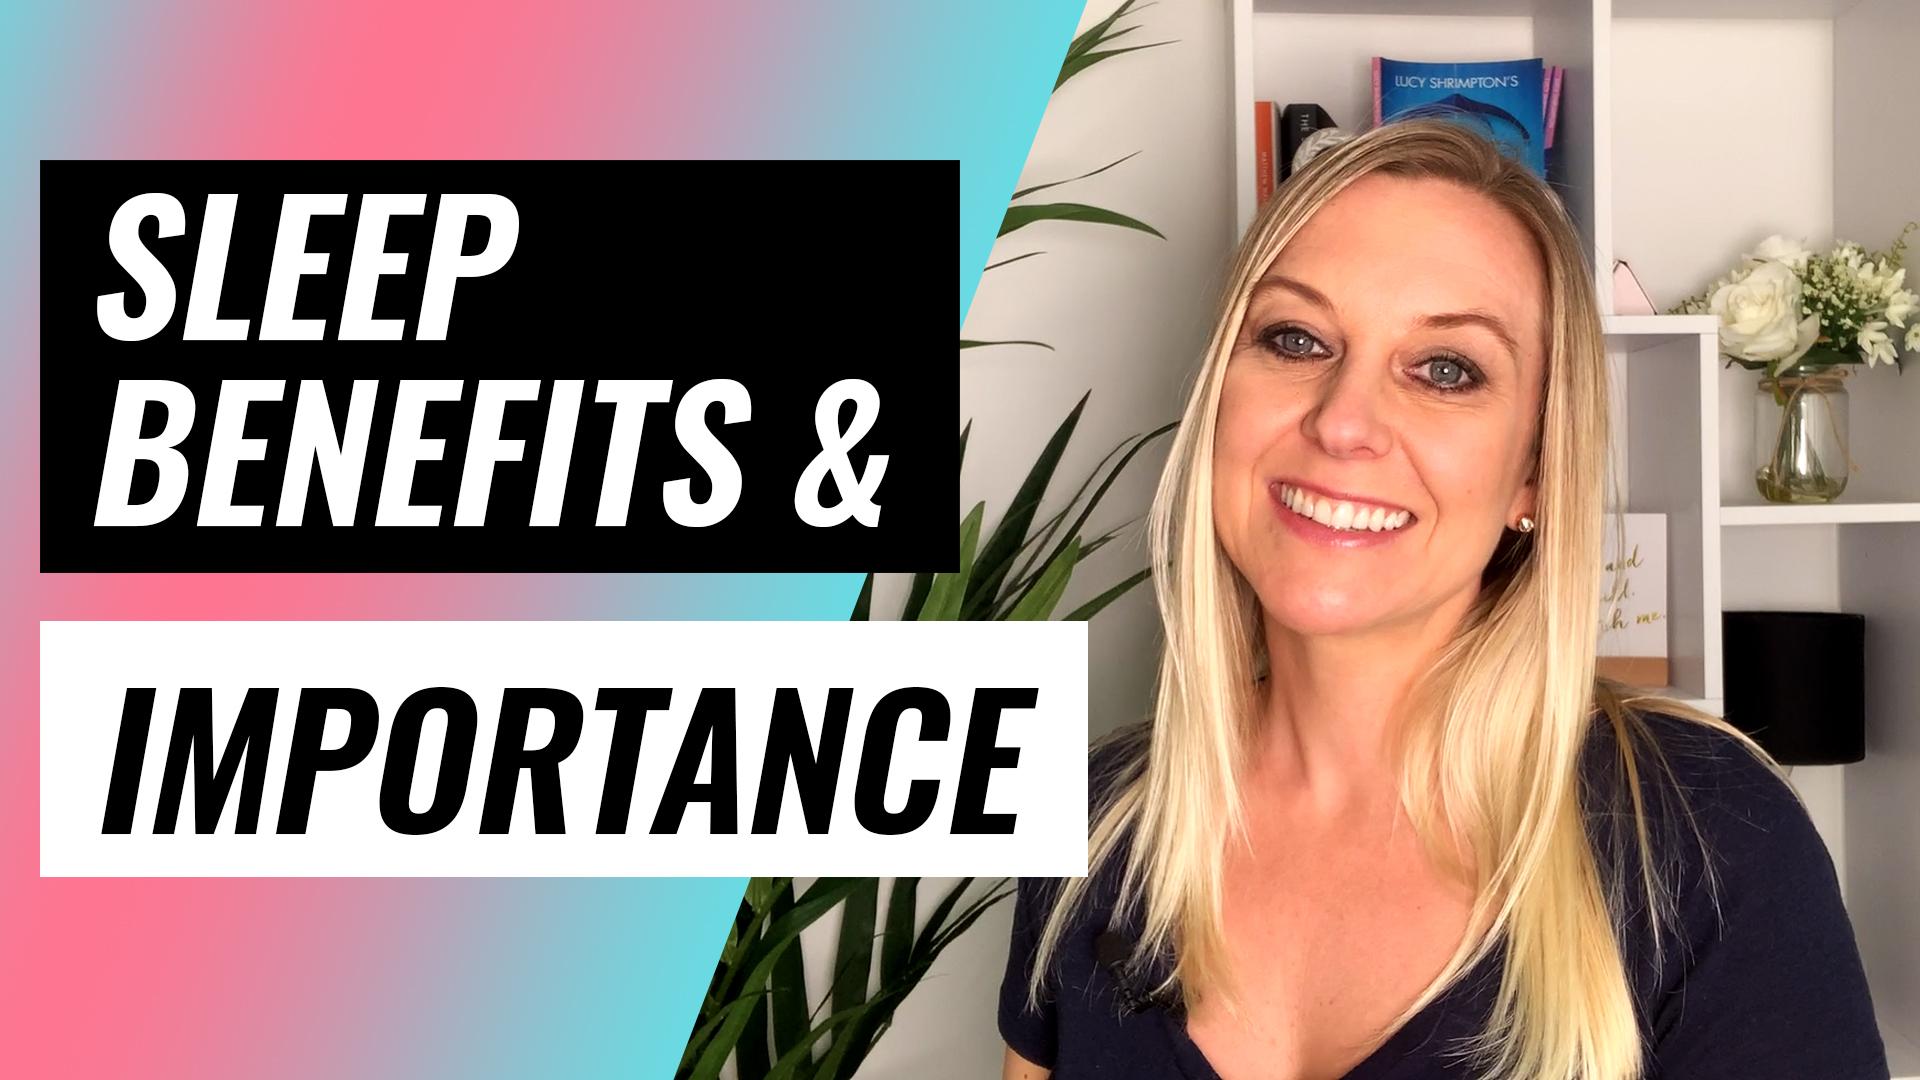 sleep benefits and importance video thumbnail